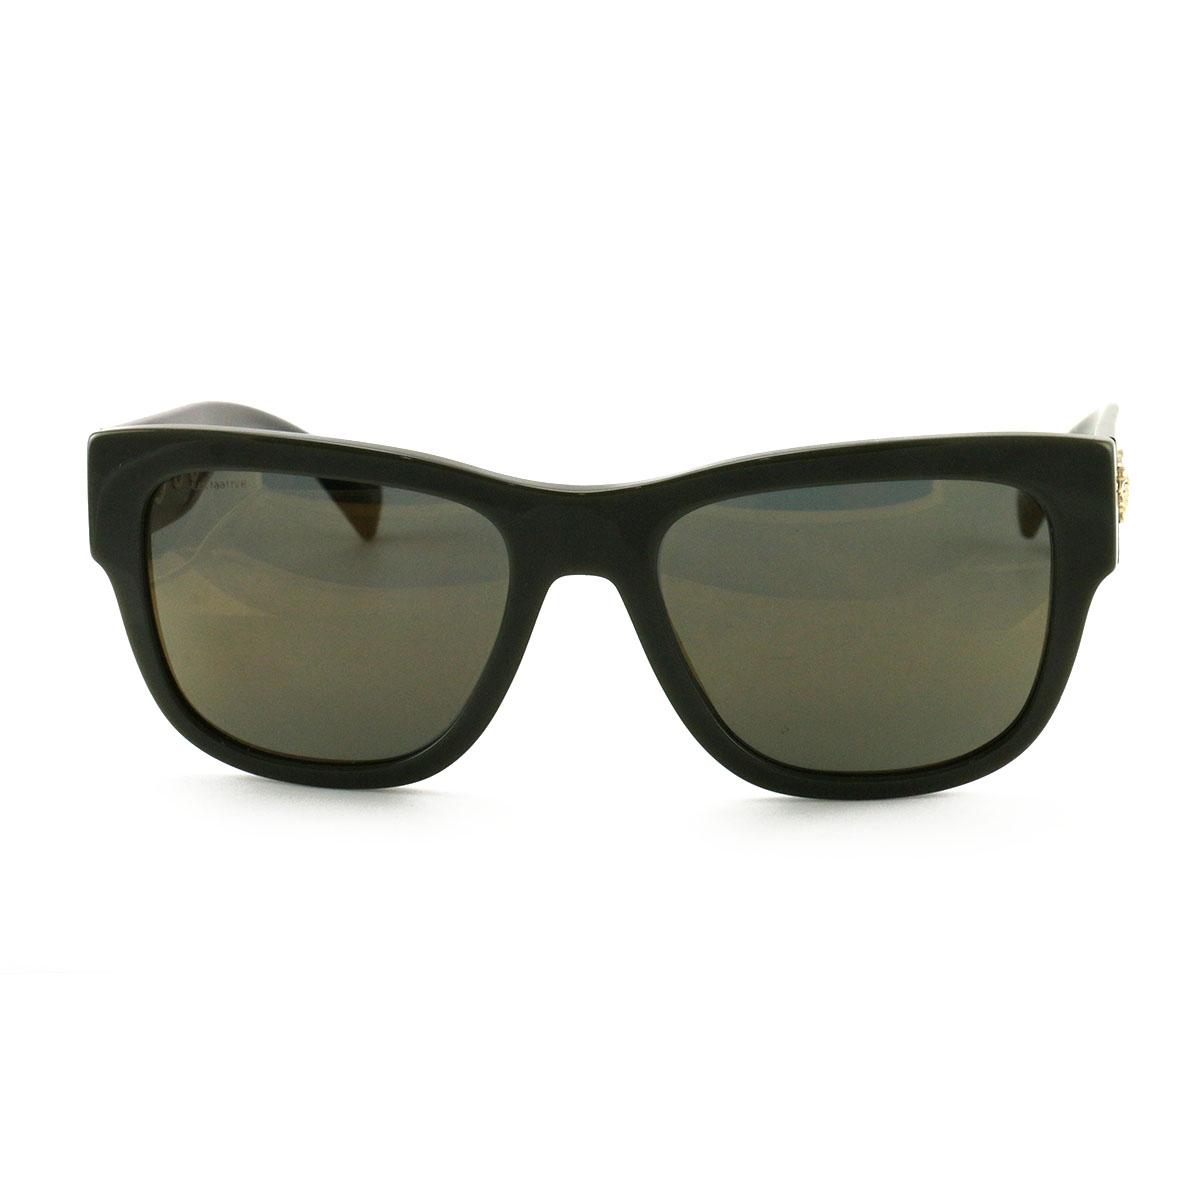 799e2a4020 Versace VE4319 Women s Sunglasses 5193 4T Olive Black Gold Mirrored 56 19  140